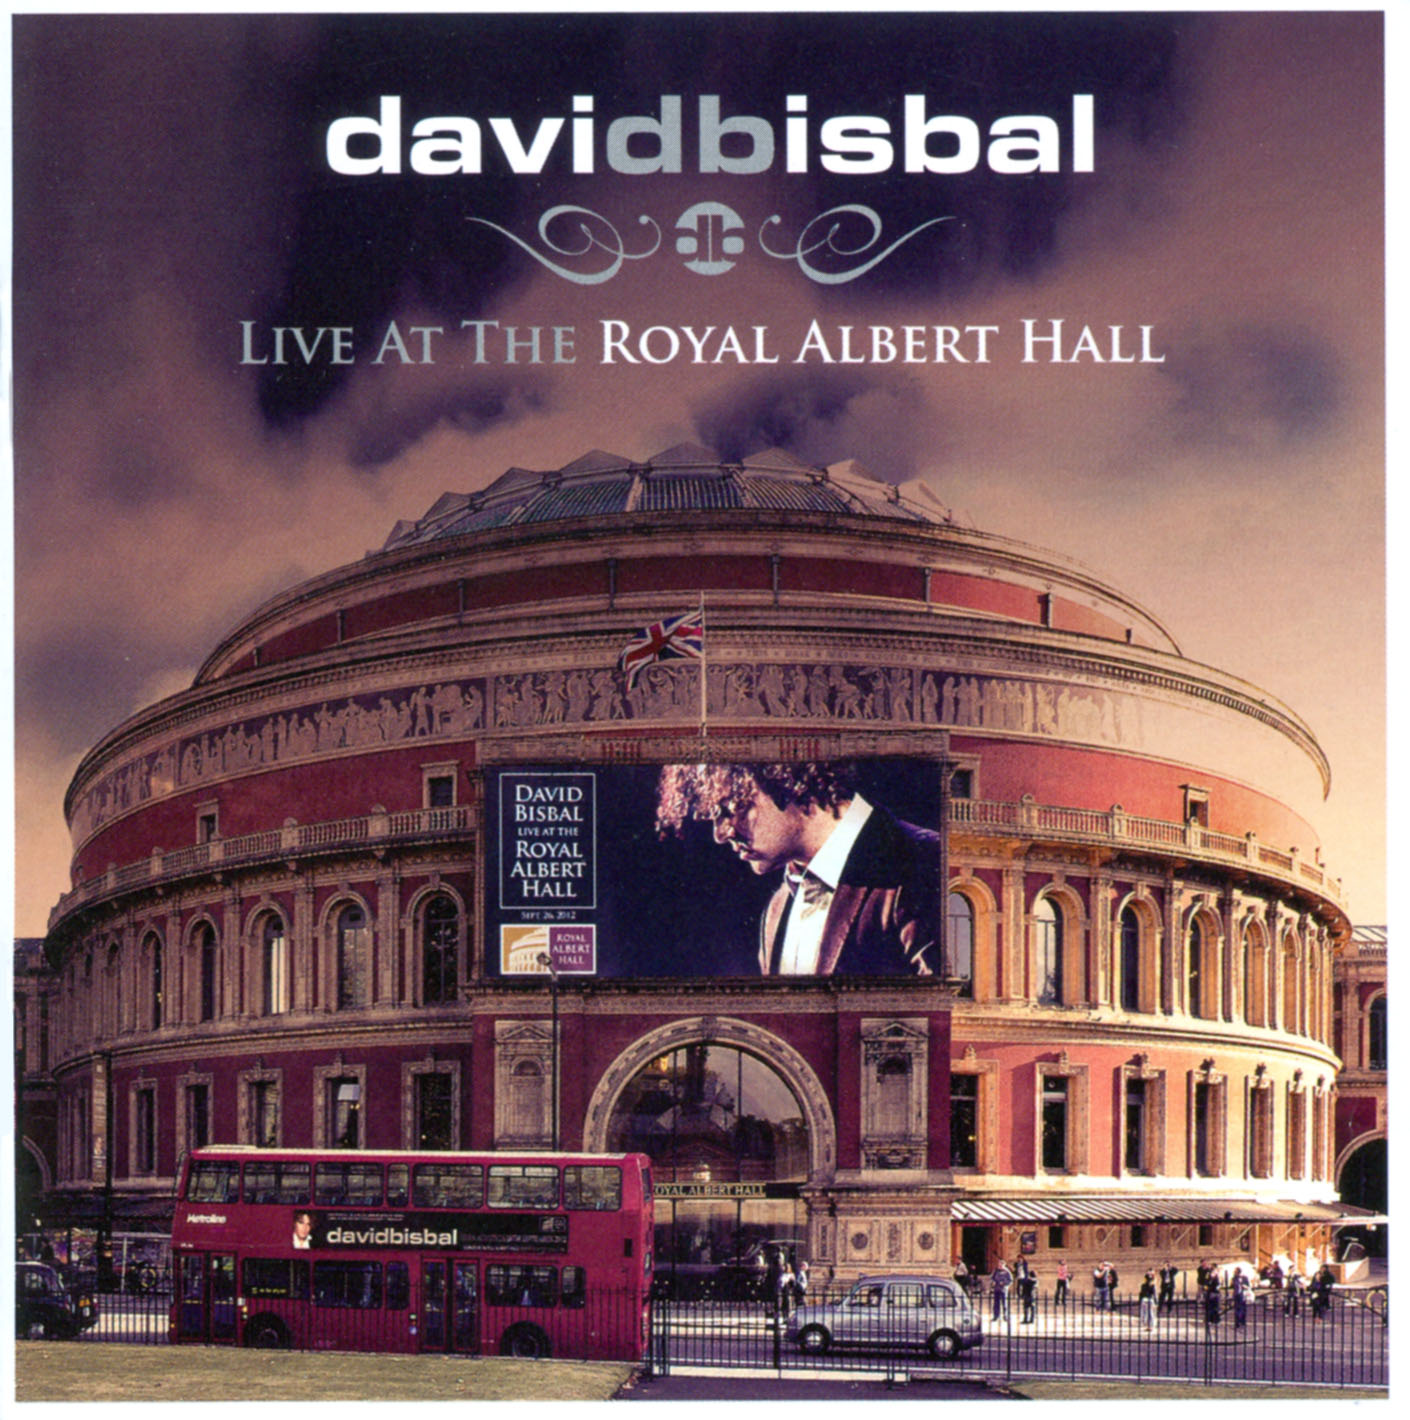 David Bisbal: Live at the Royal Albert Hall